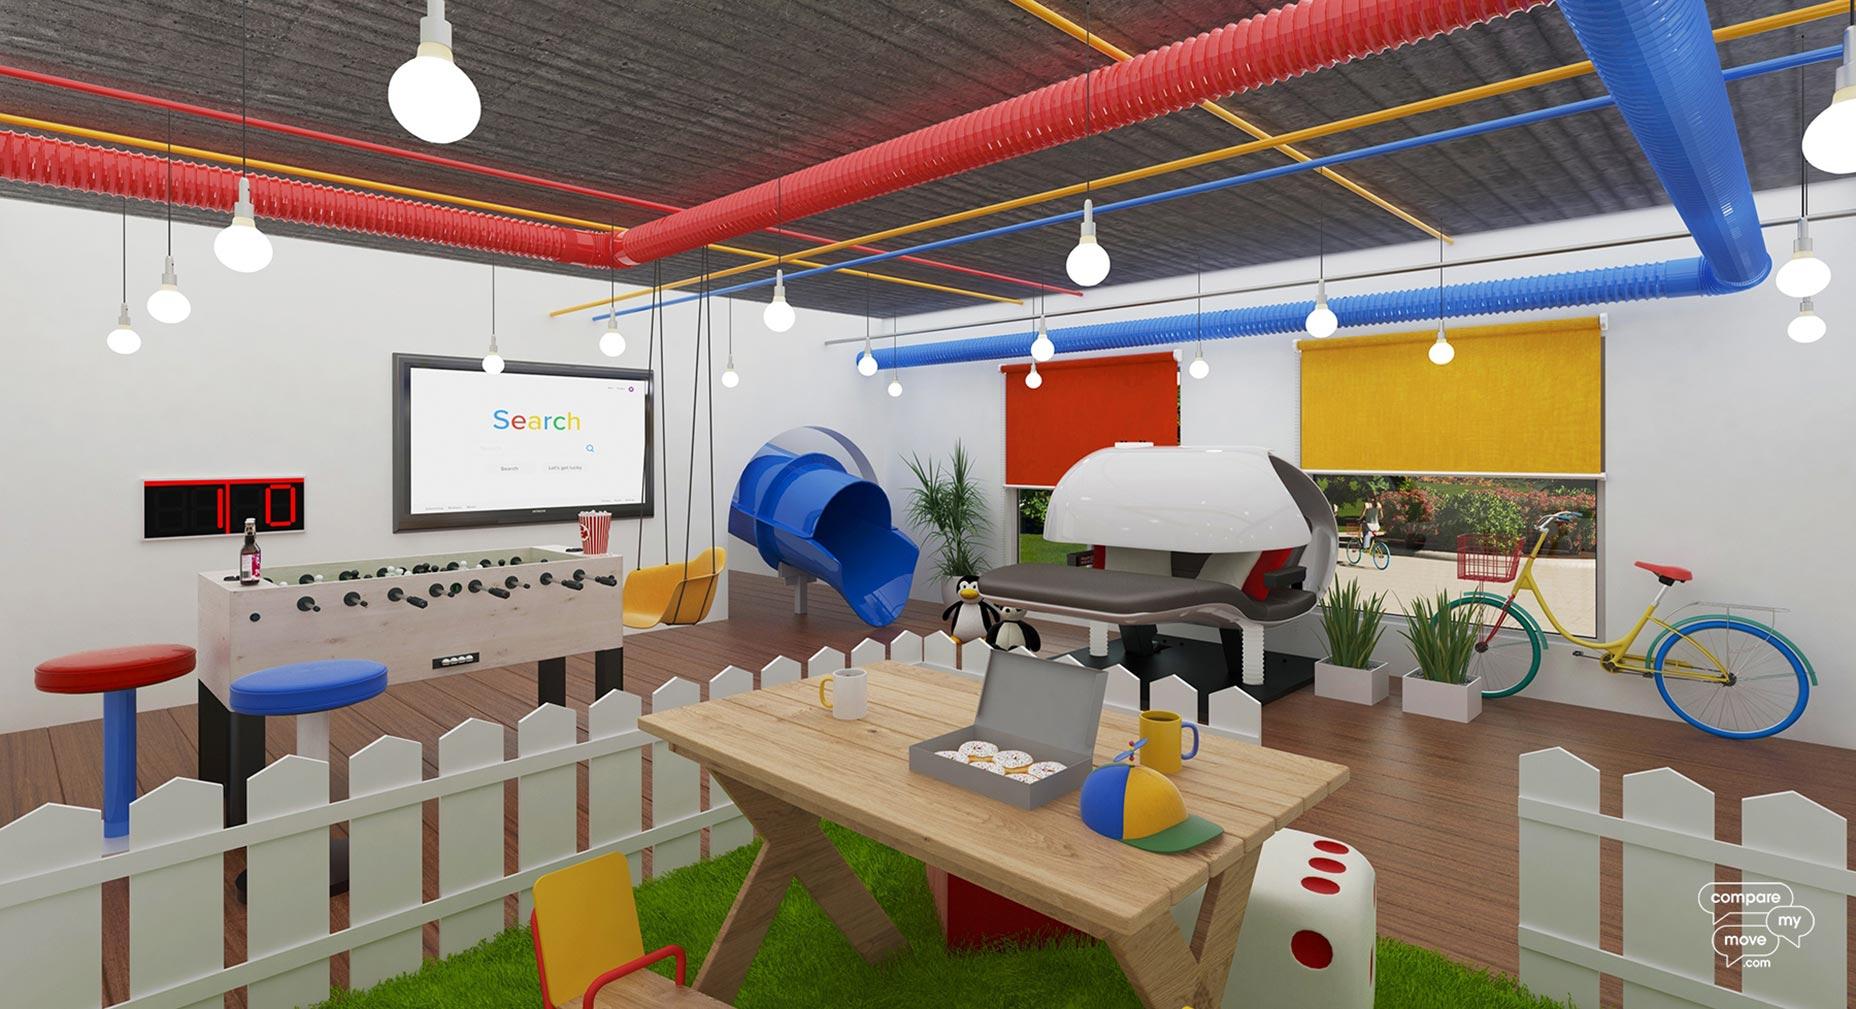 google_room_1800